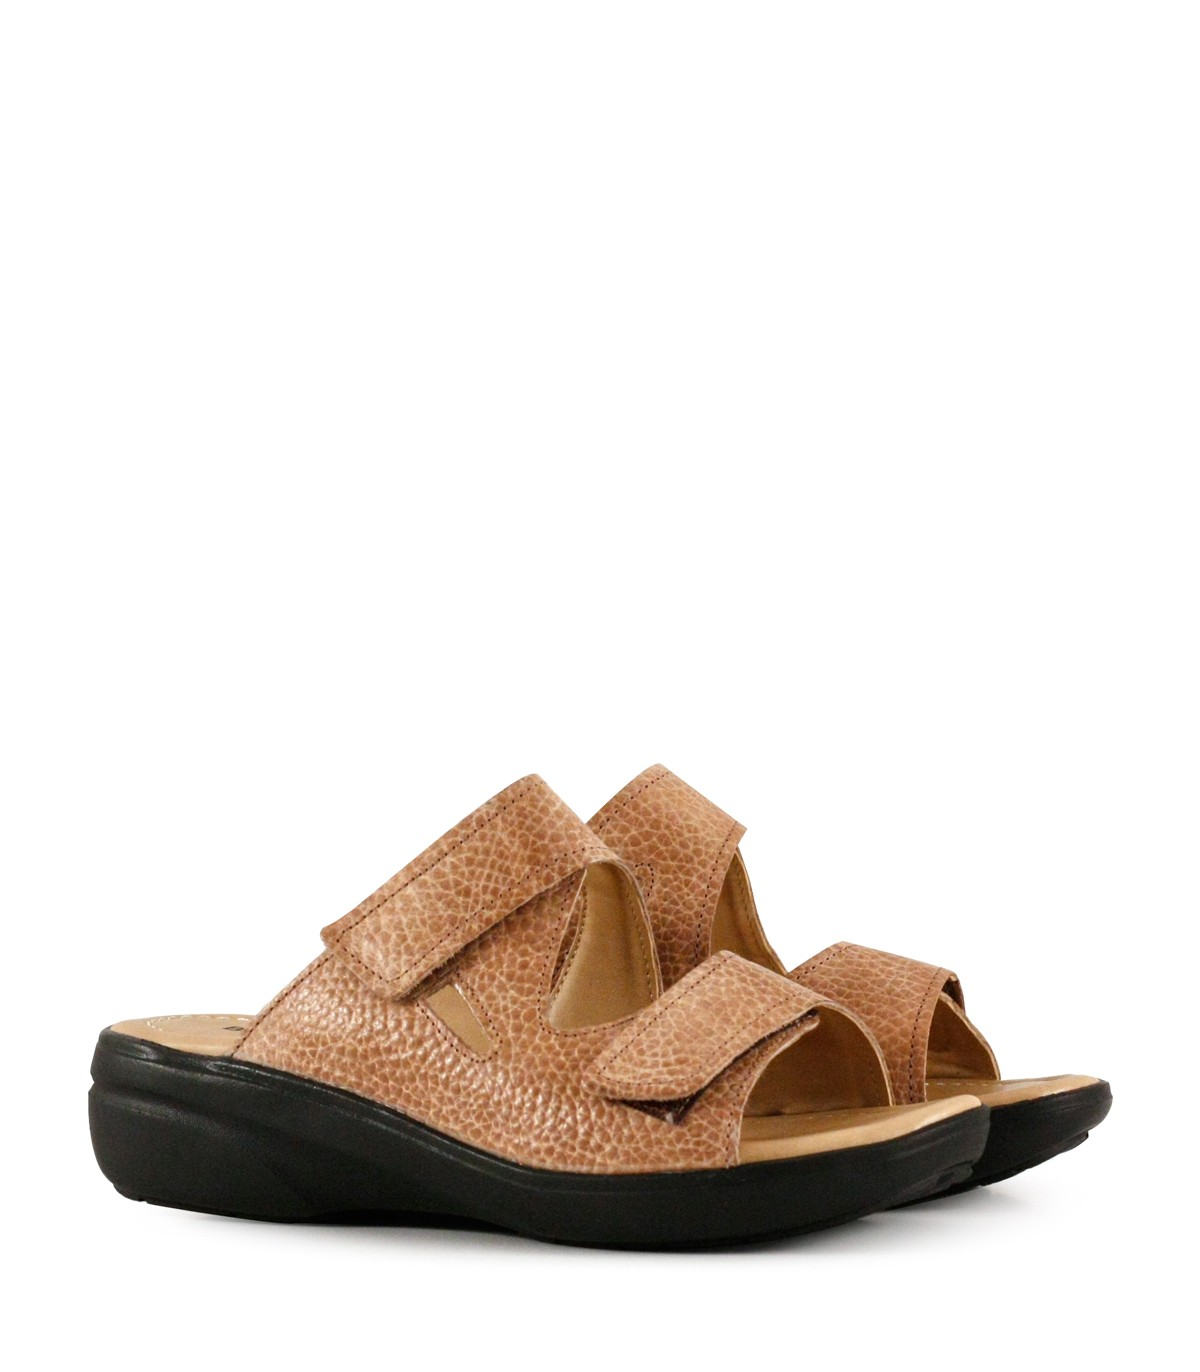 100% autentico 5a75b ce41a Zuecos para mujer | zapatos confort | Batistella